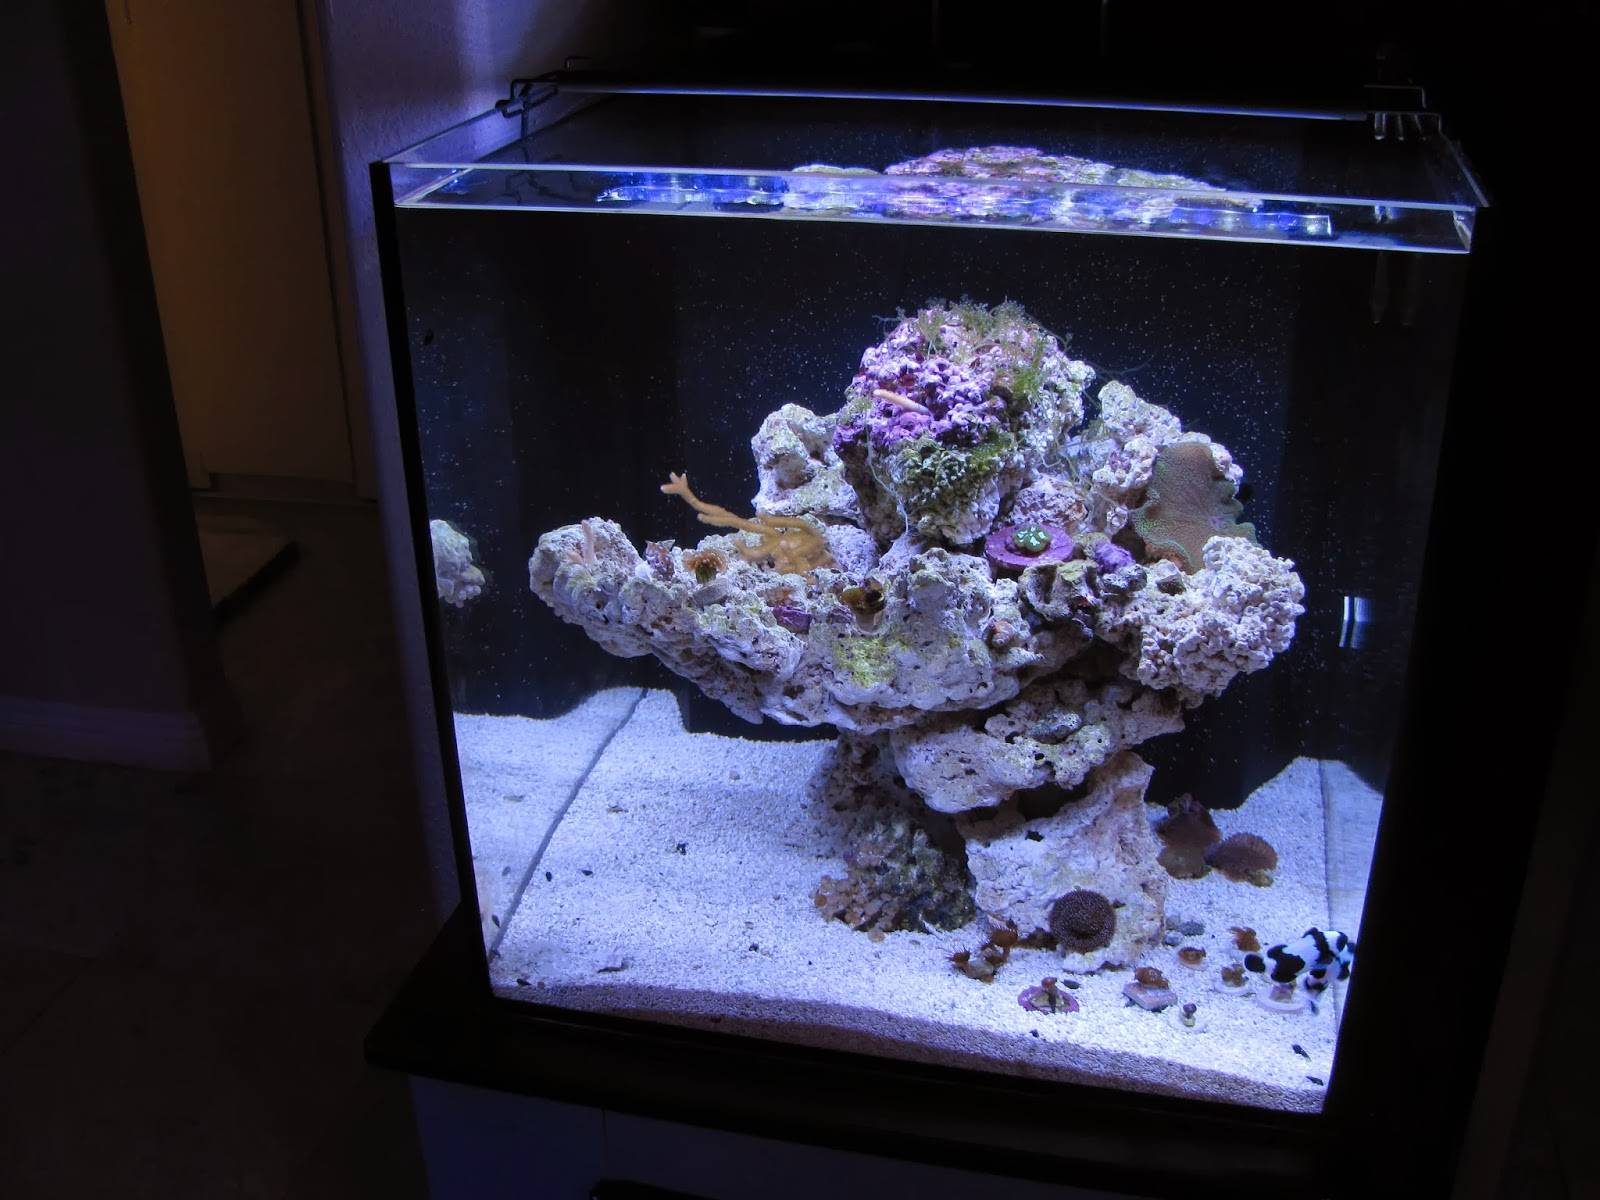 Orbit Marine LED Aquarium Light setup on the aquarium